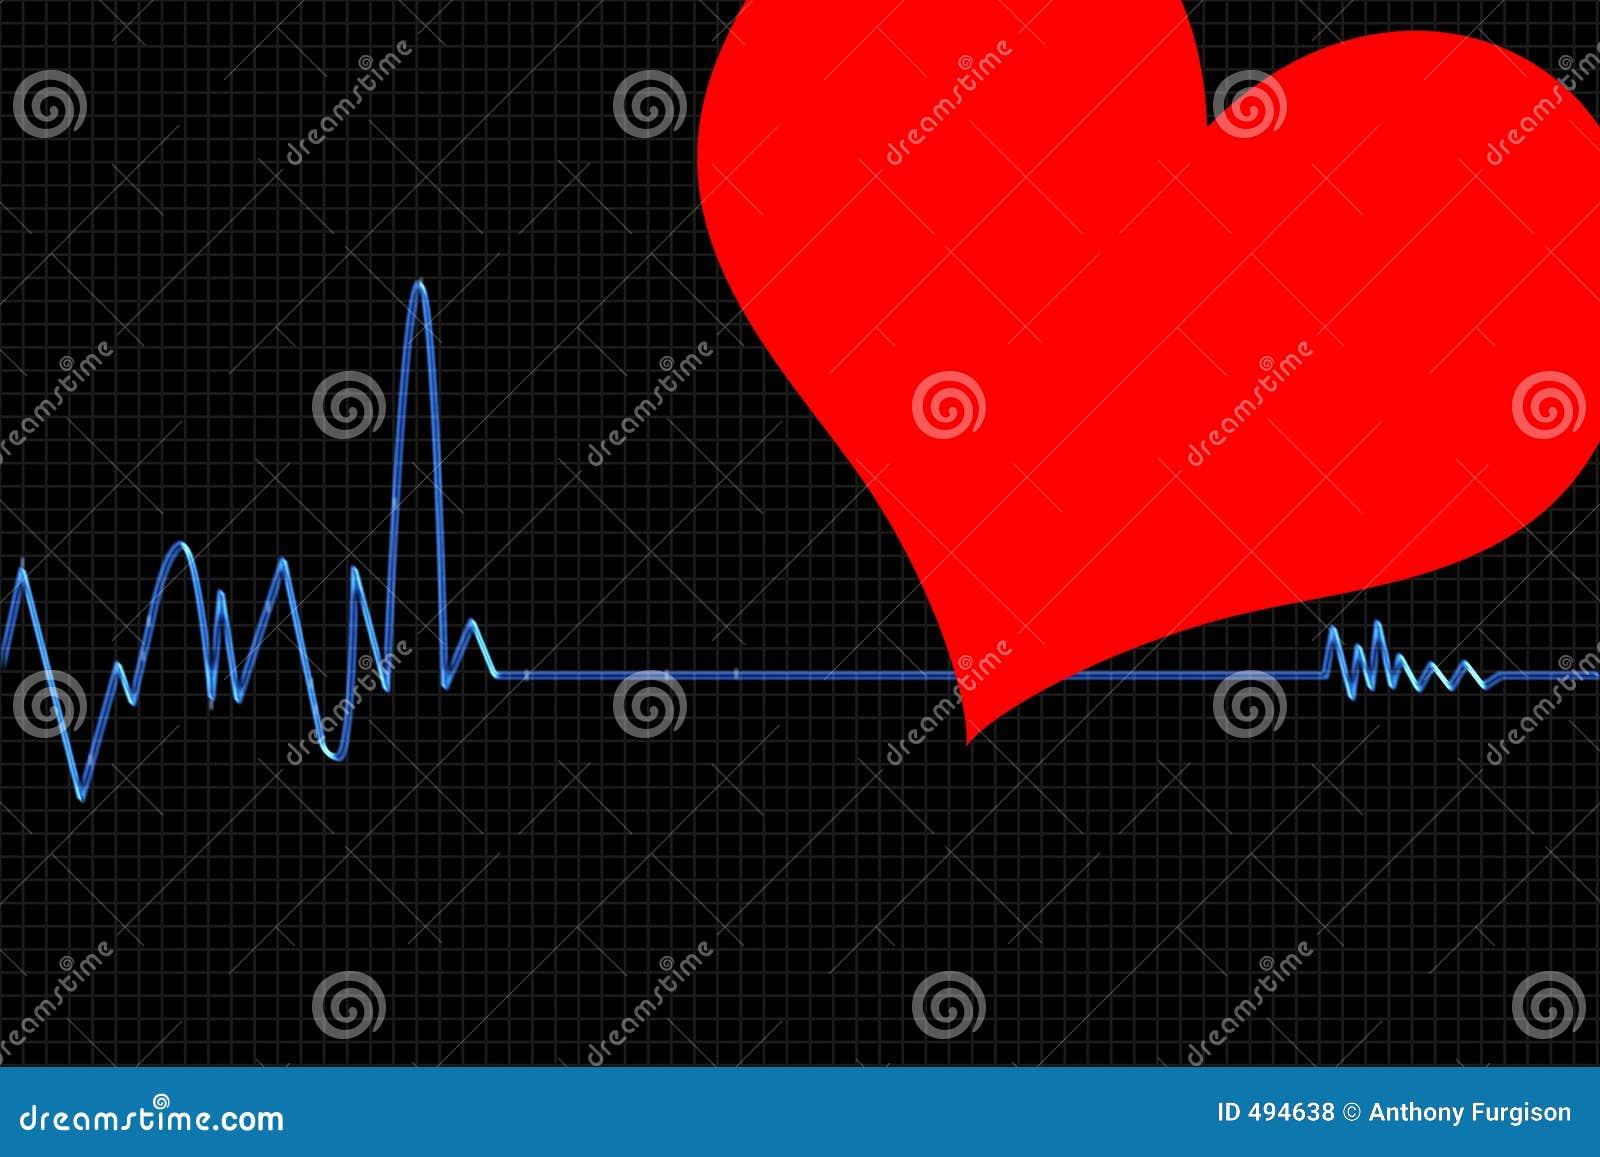 Cardiogram1